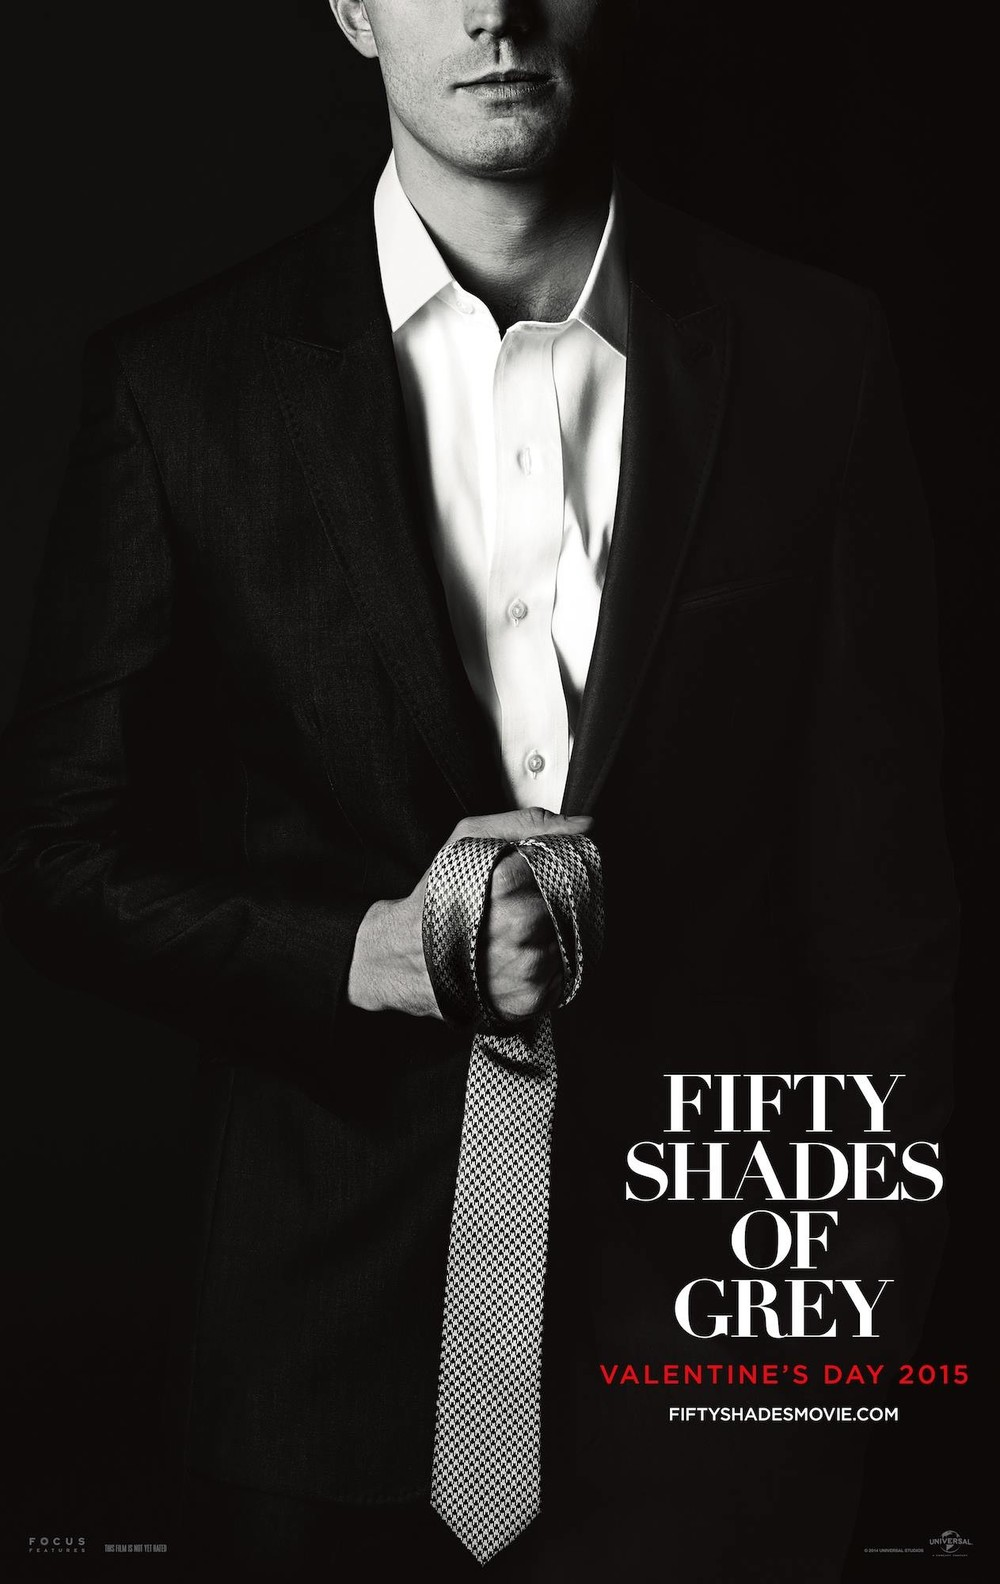 Fifty Shades of Grey DVD Release Date | Redbox, Netflix